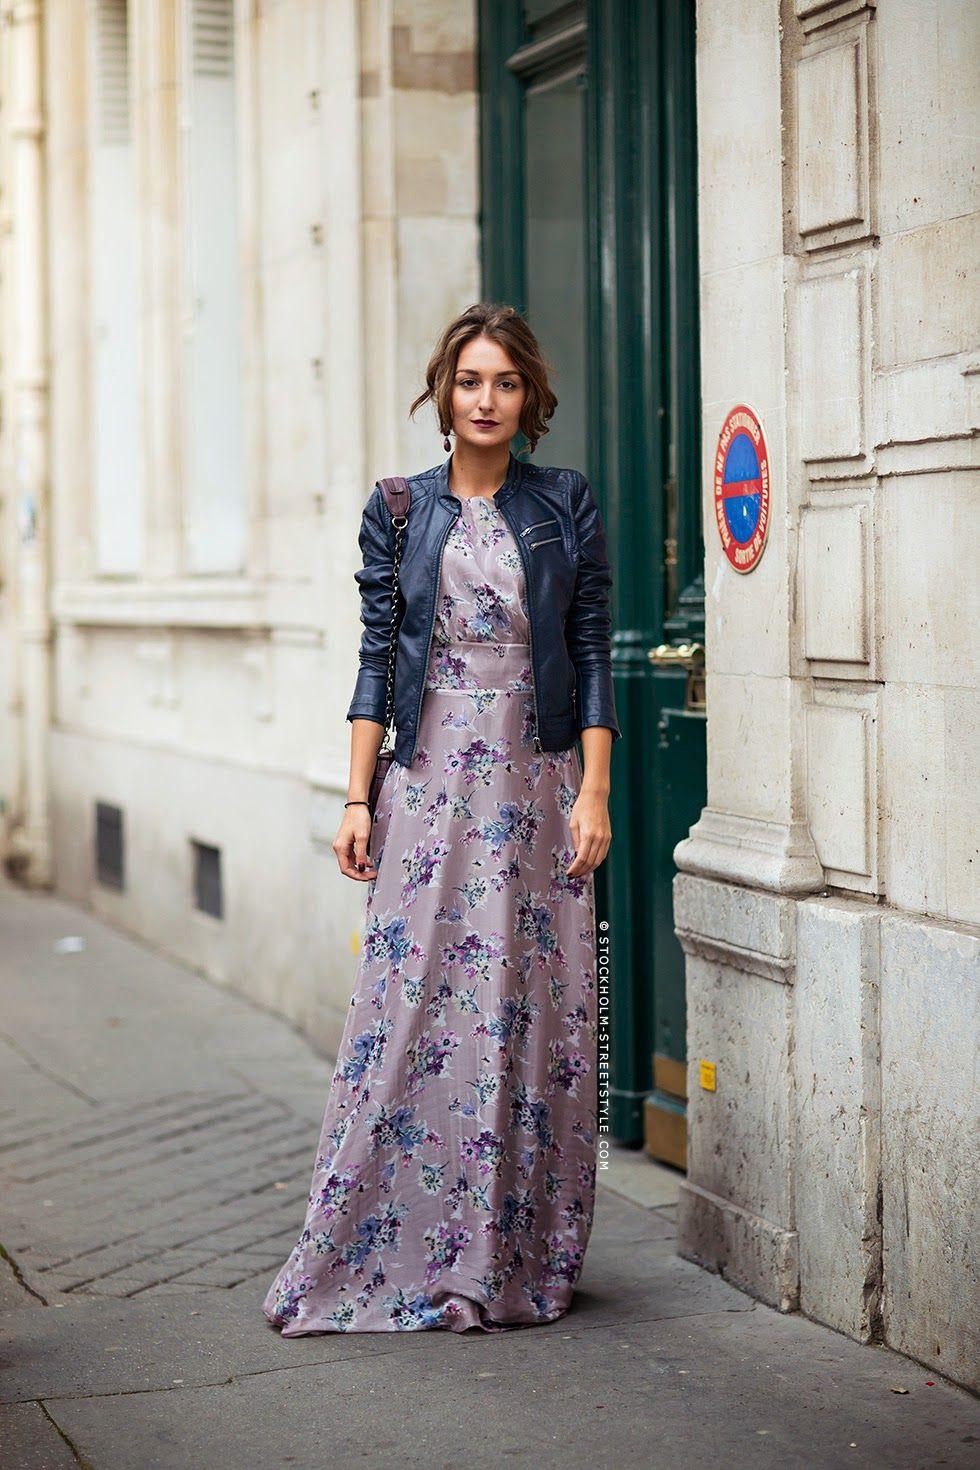 I Love Leather Jackets Over Super Feminine Dresses